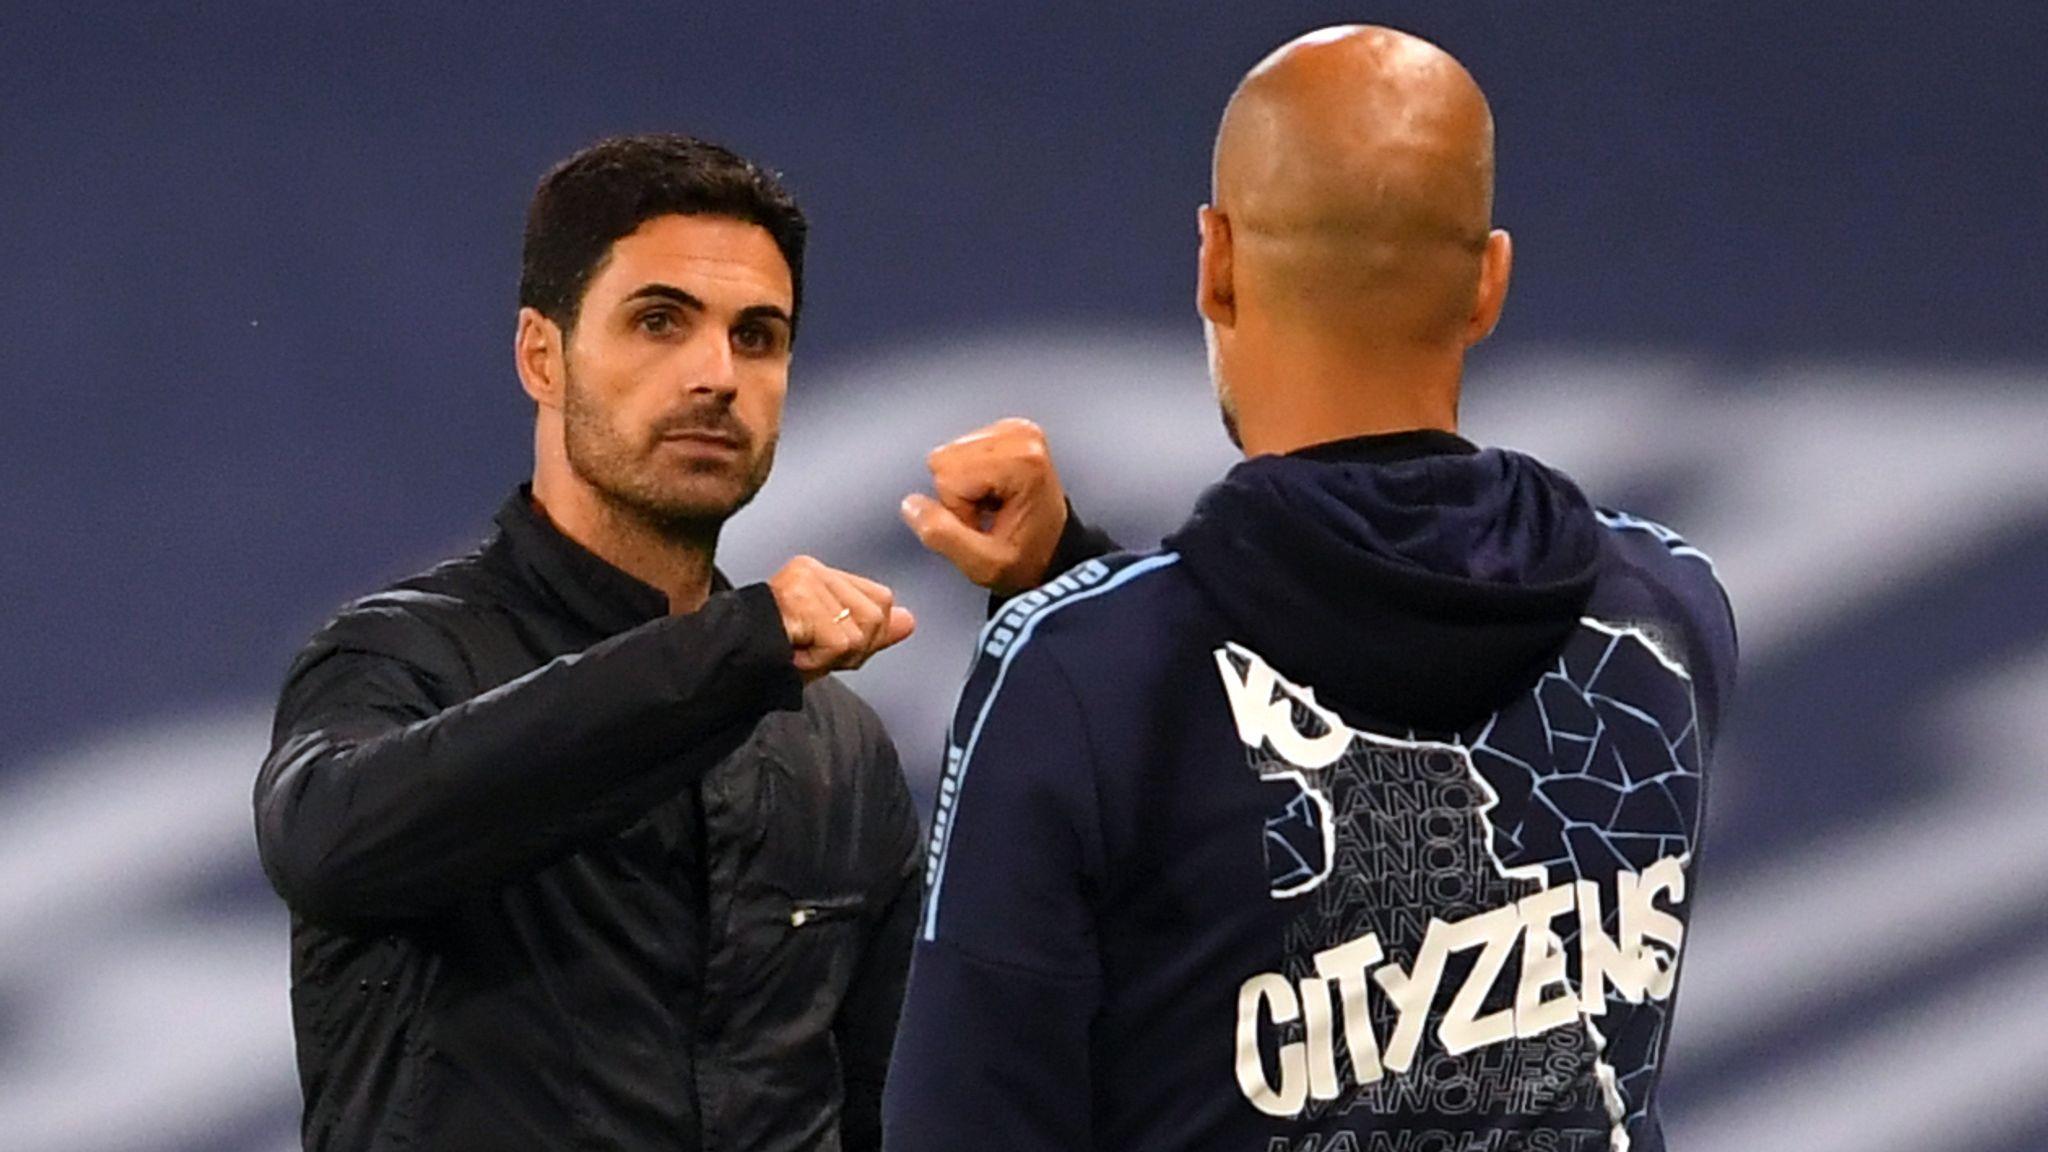 Arteta battling with ex-mentor Guardiola to secure Arsenal's first summer transfer - Bóng Đá